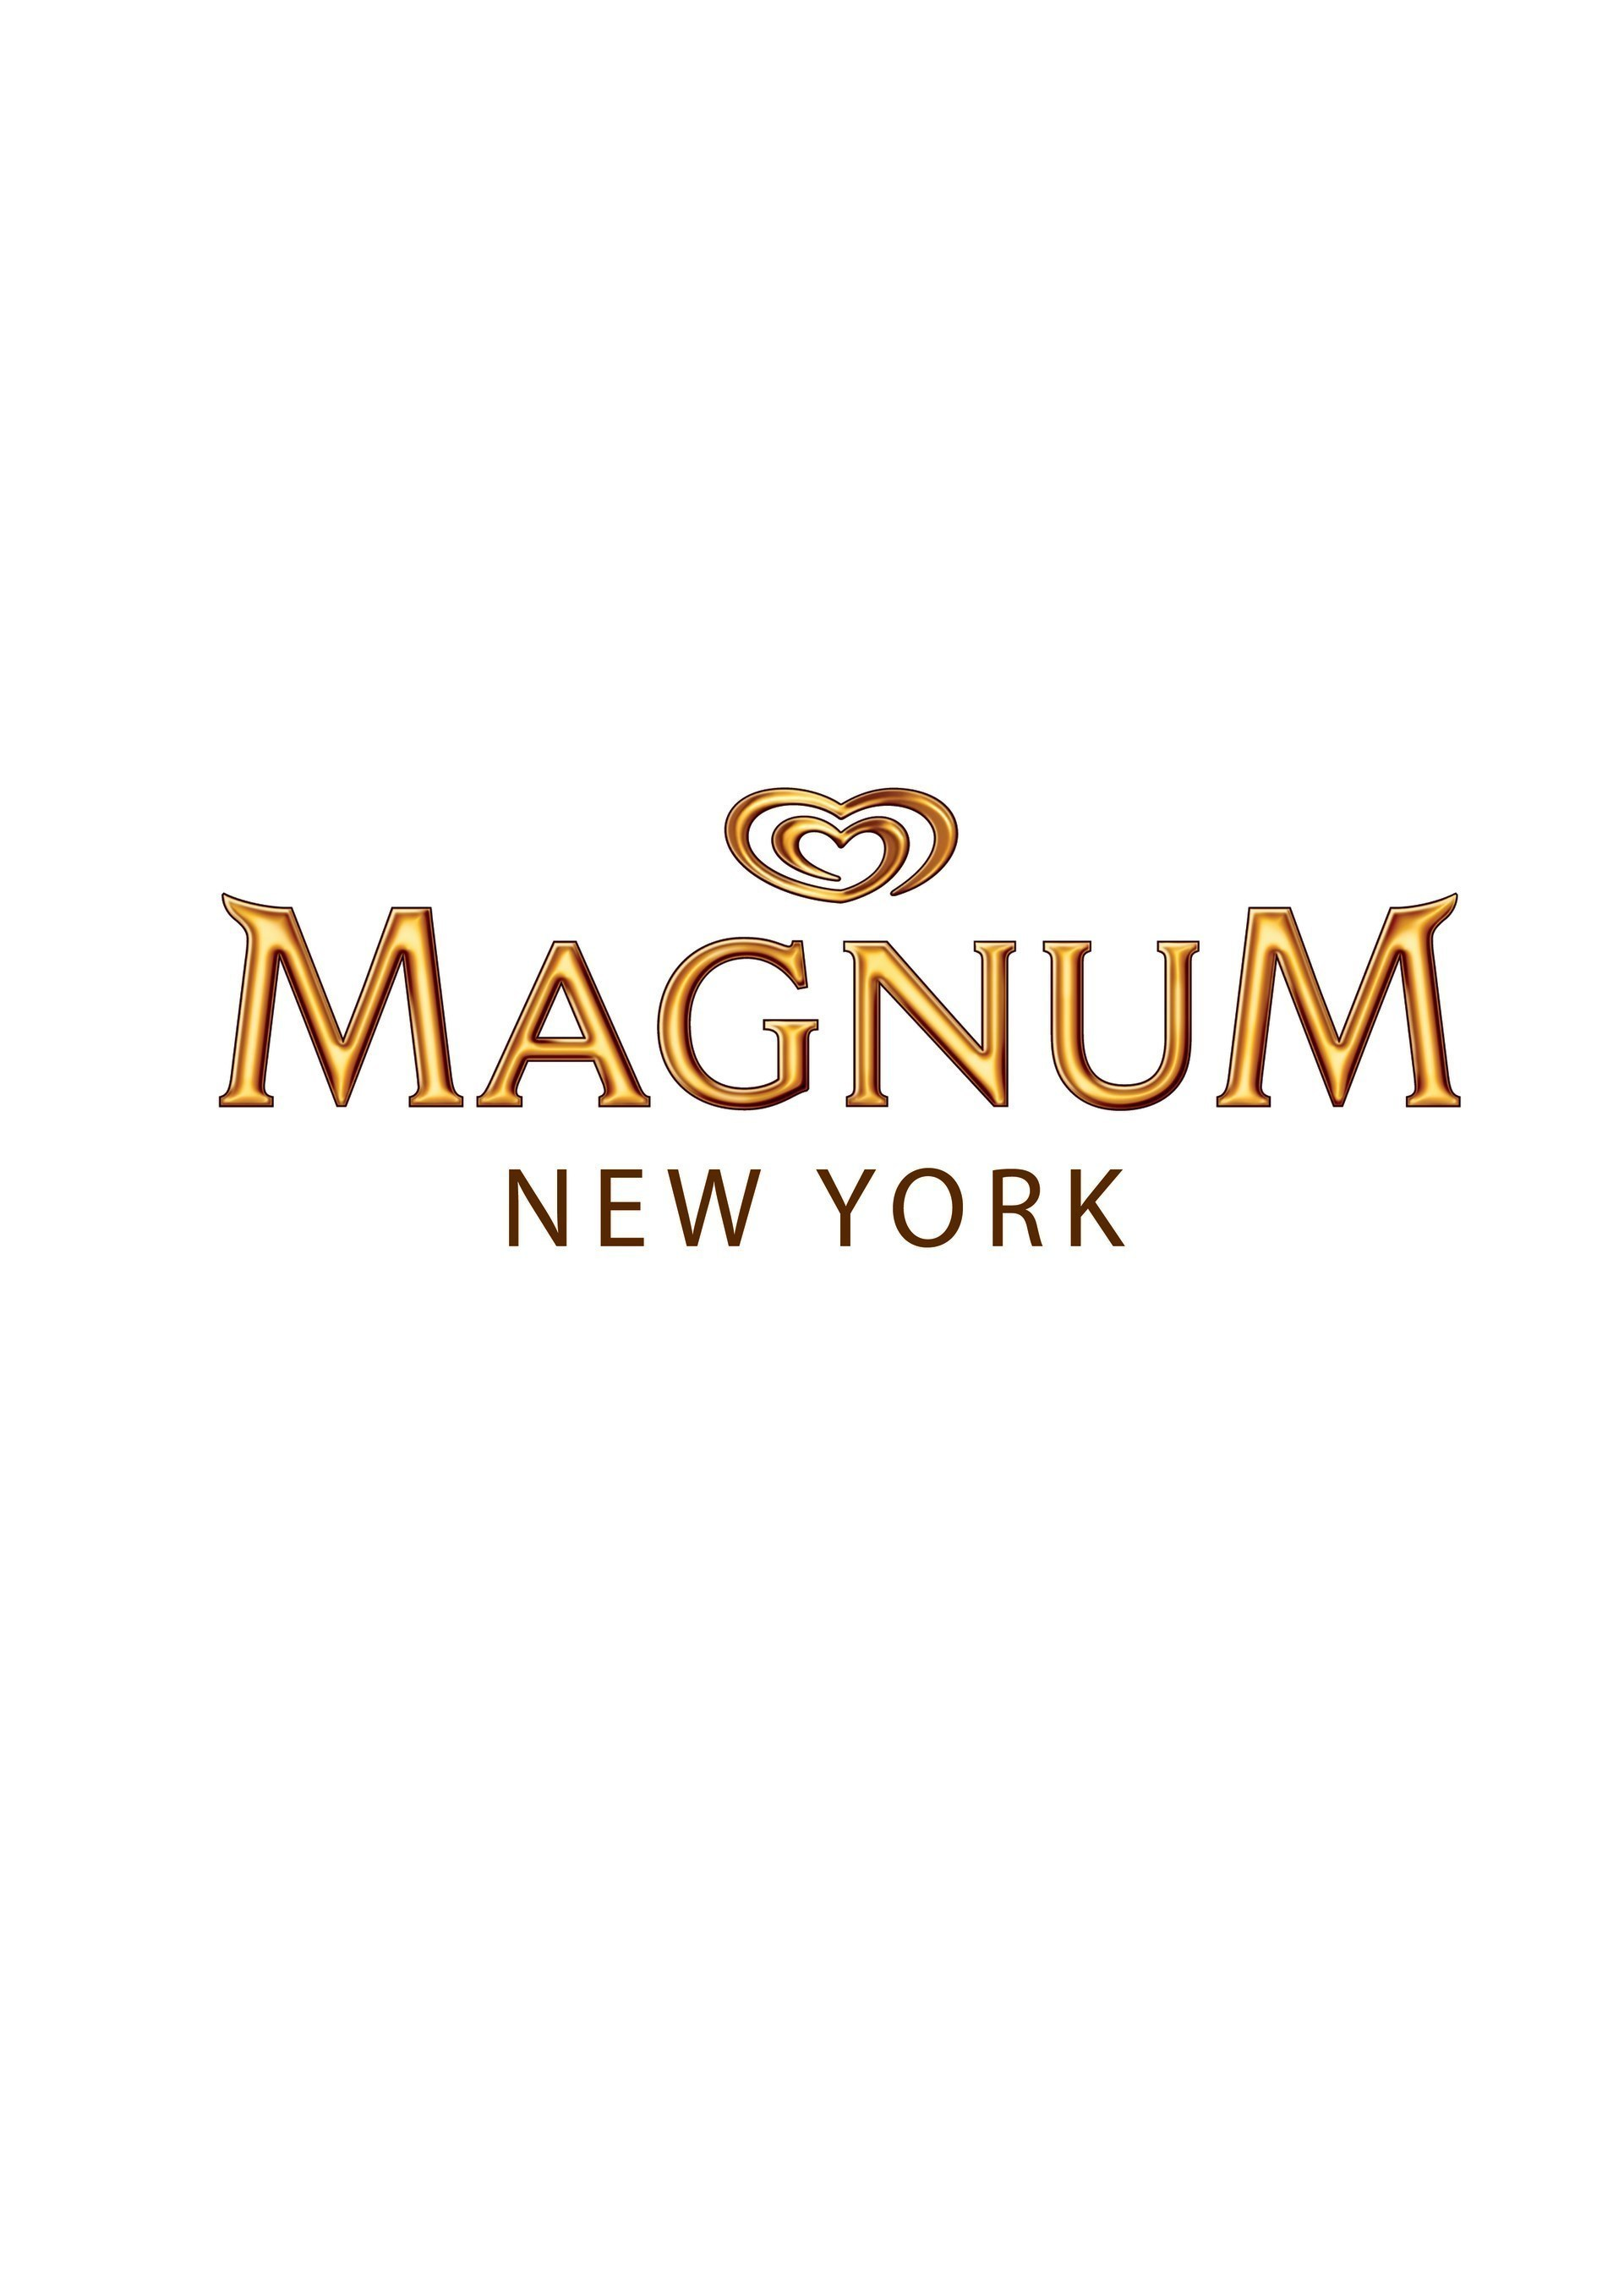 MAGNUM New York